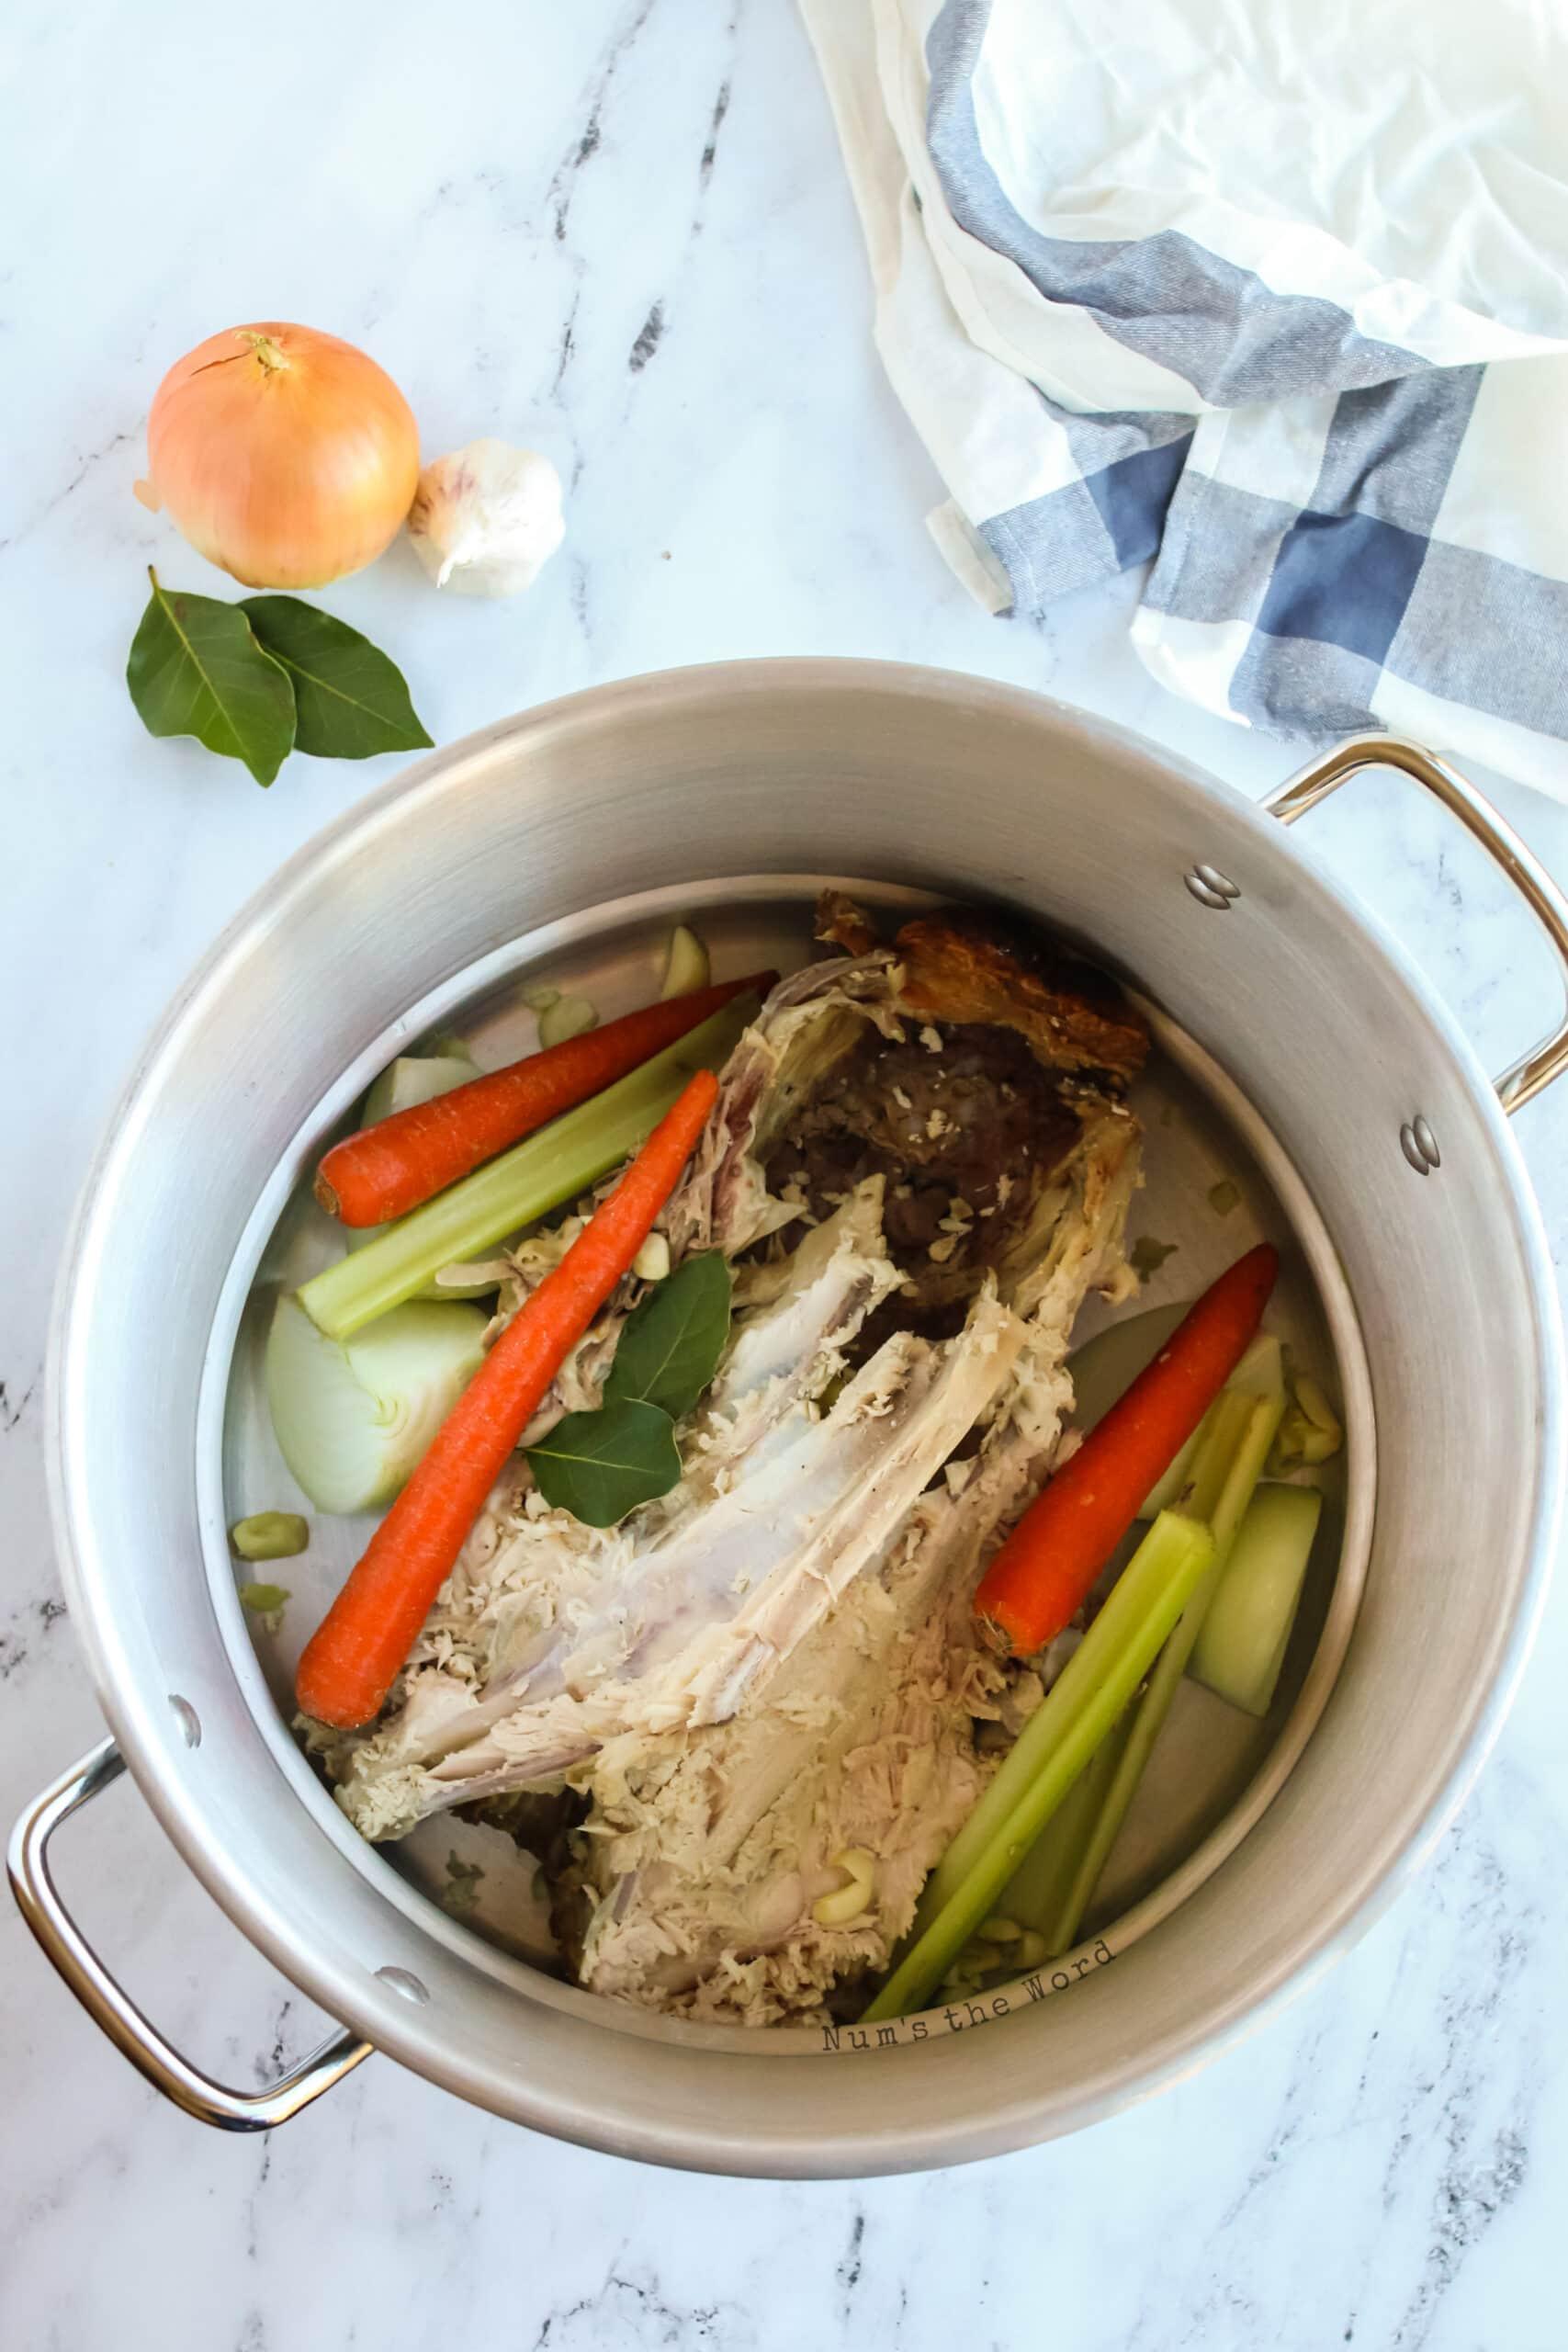 vegetables added to turkey bones in large pot